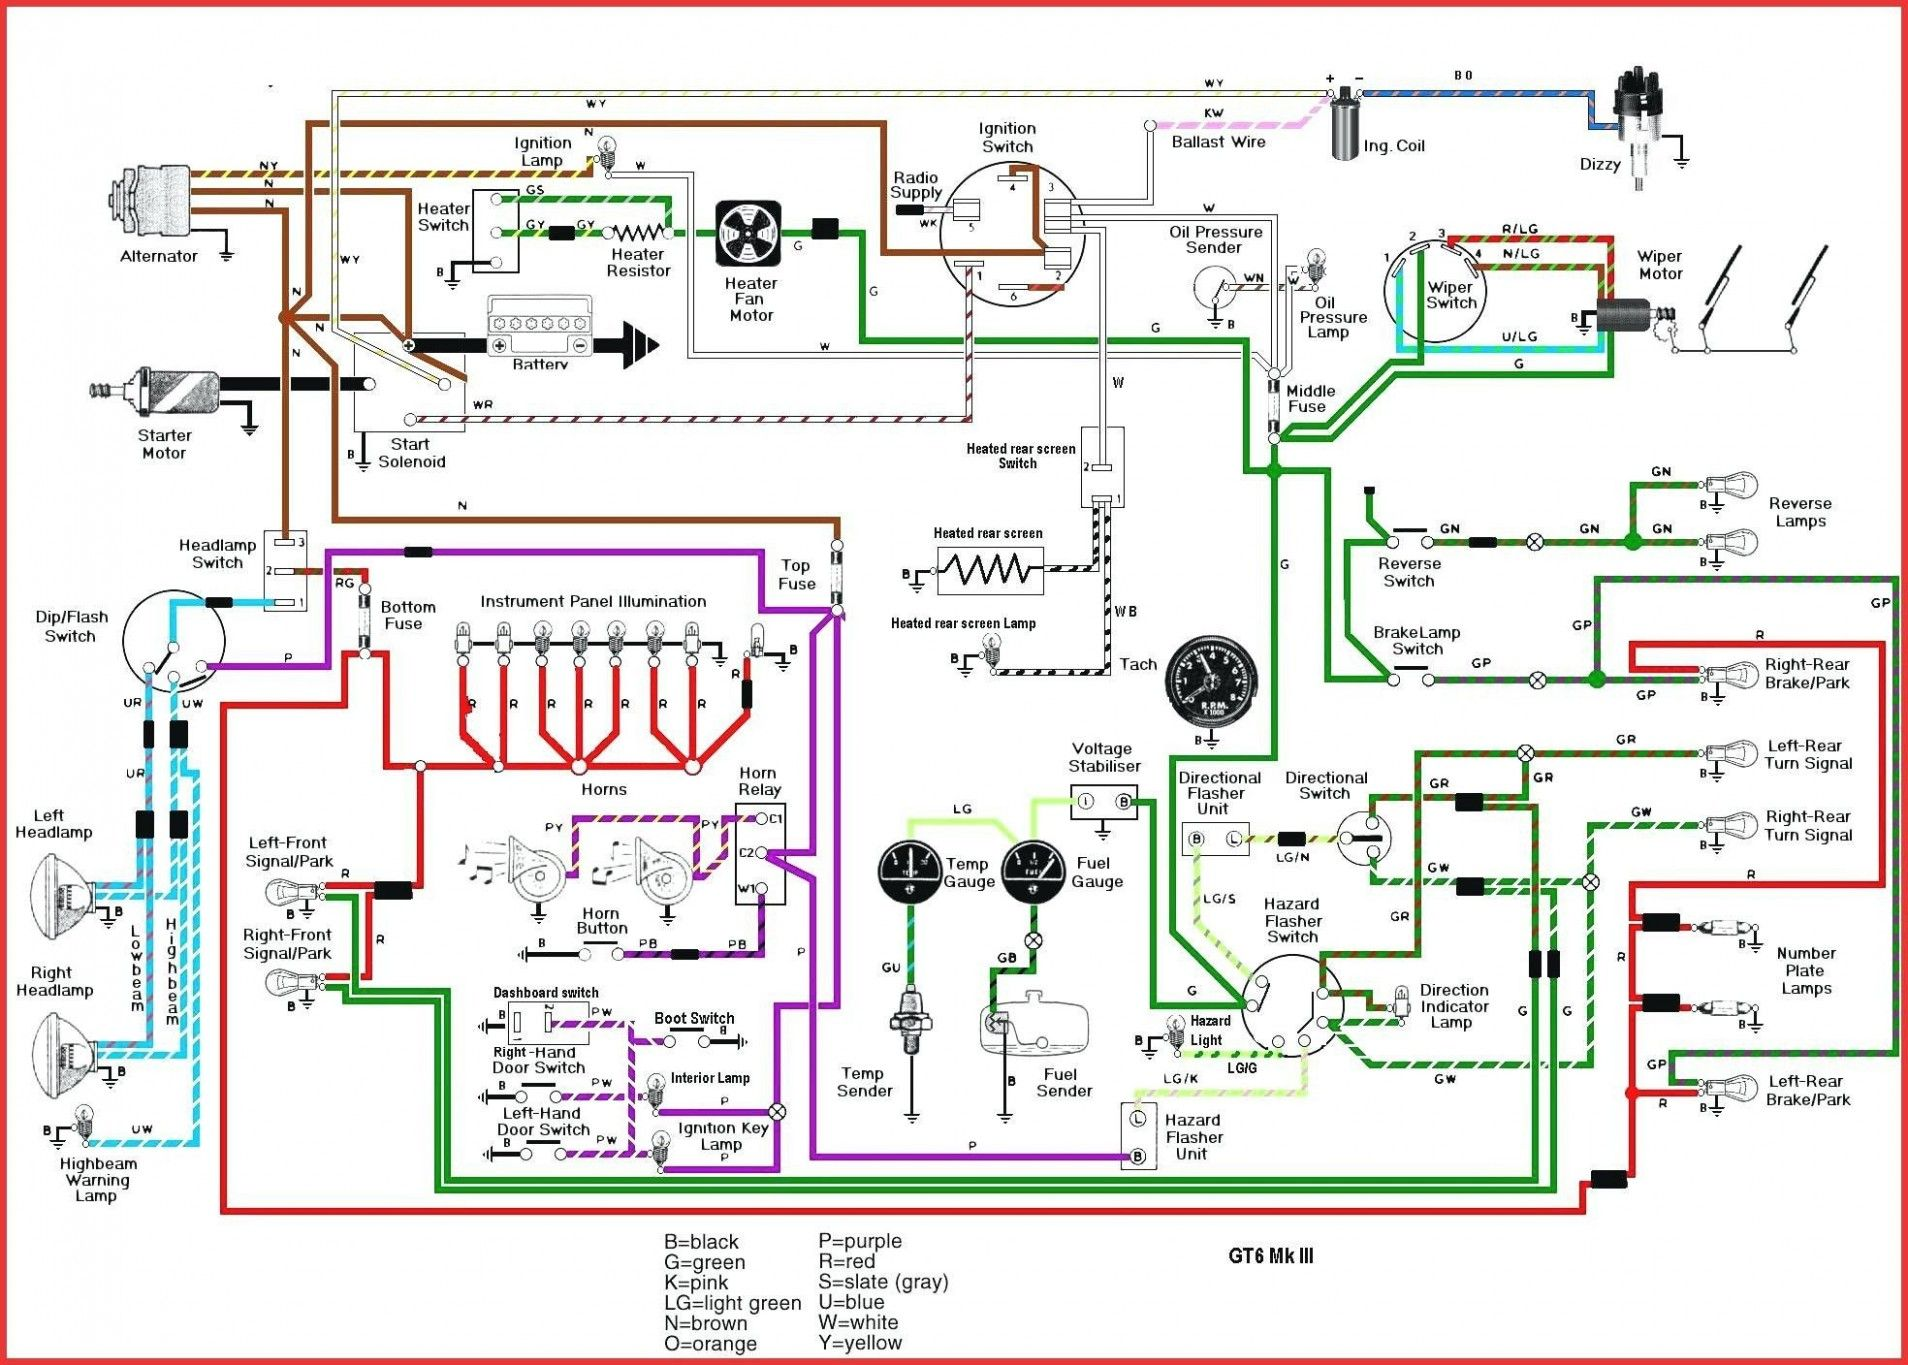 Vw Up Engine Diagram Symbols Vw Up Engine Diagram Symbols